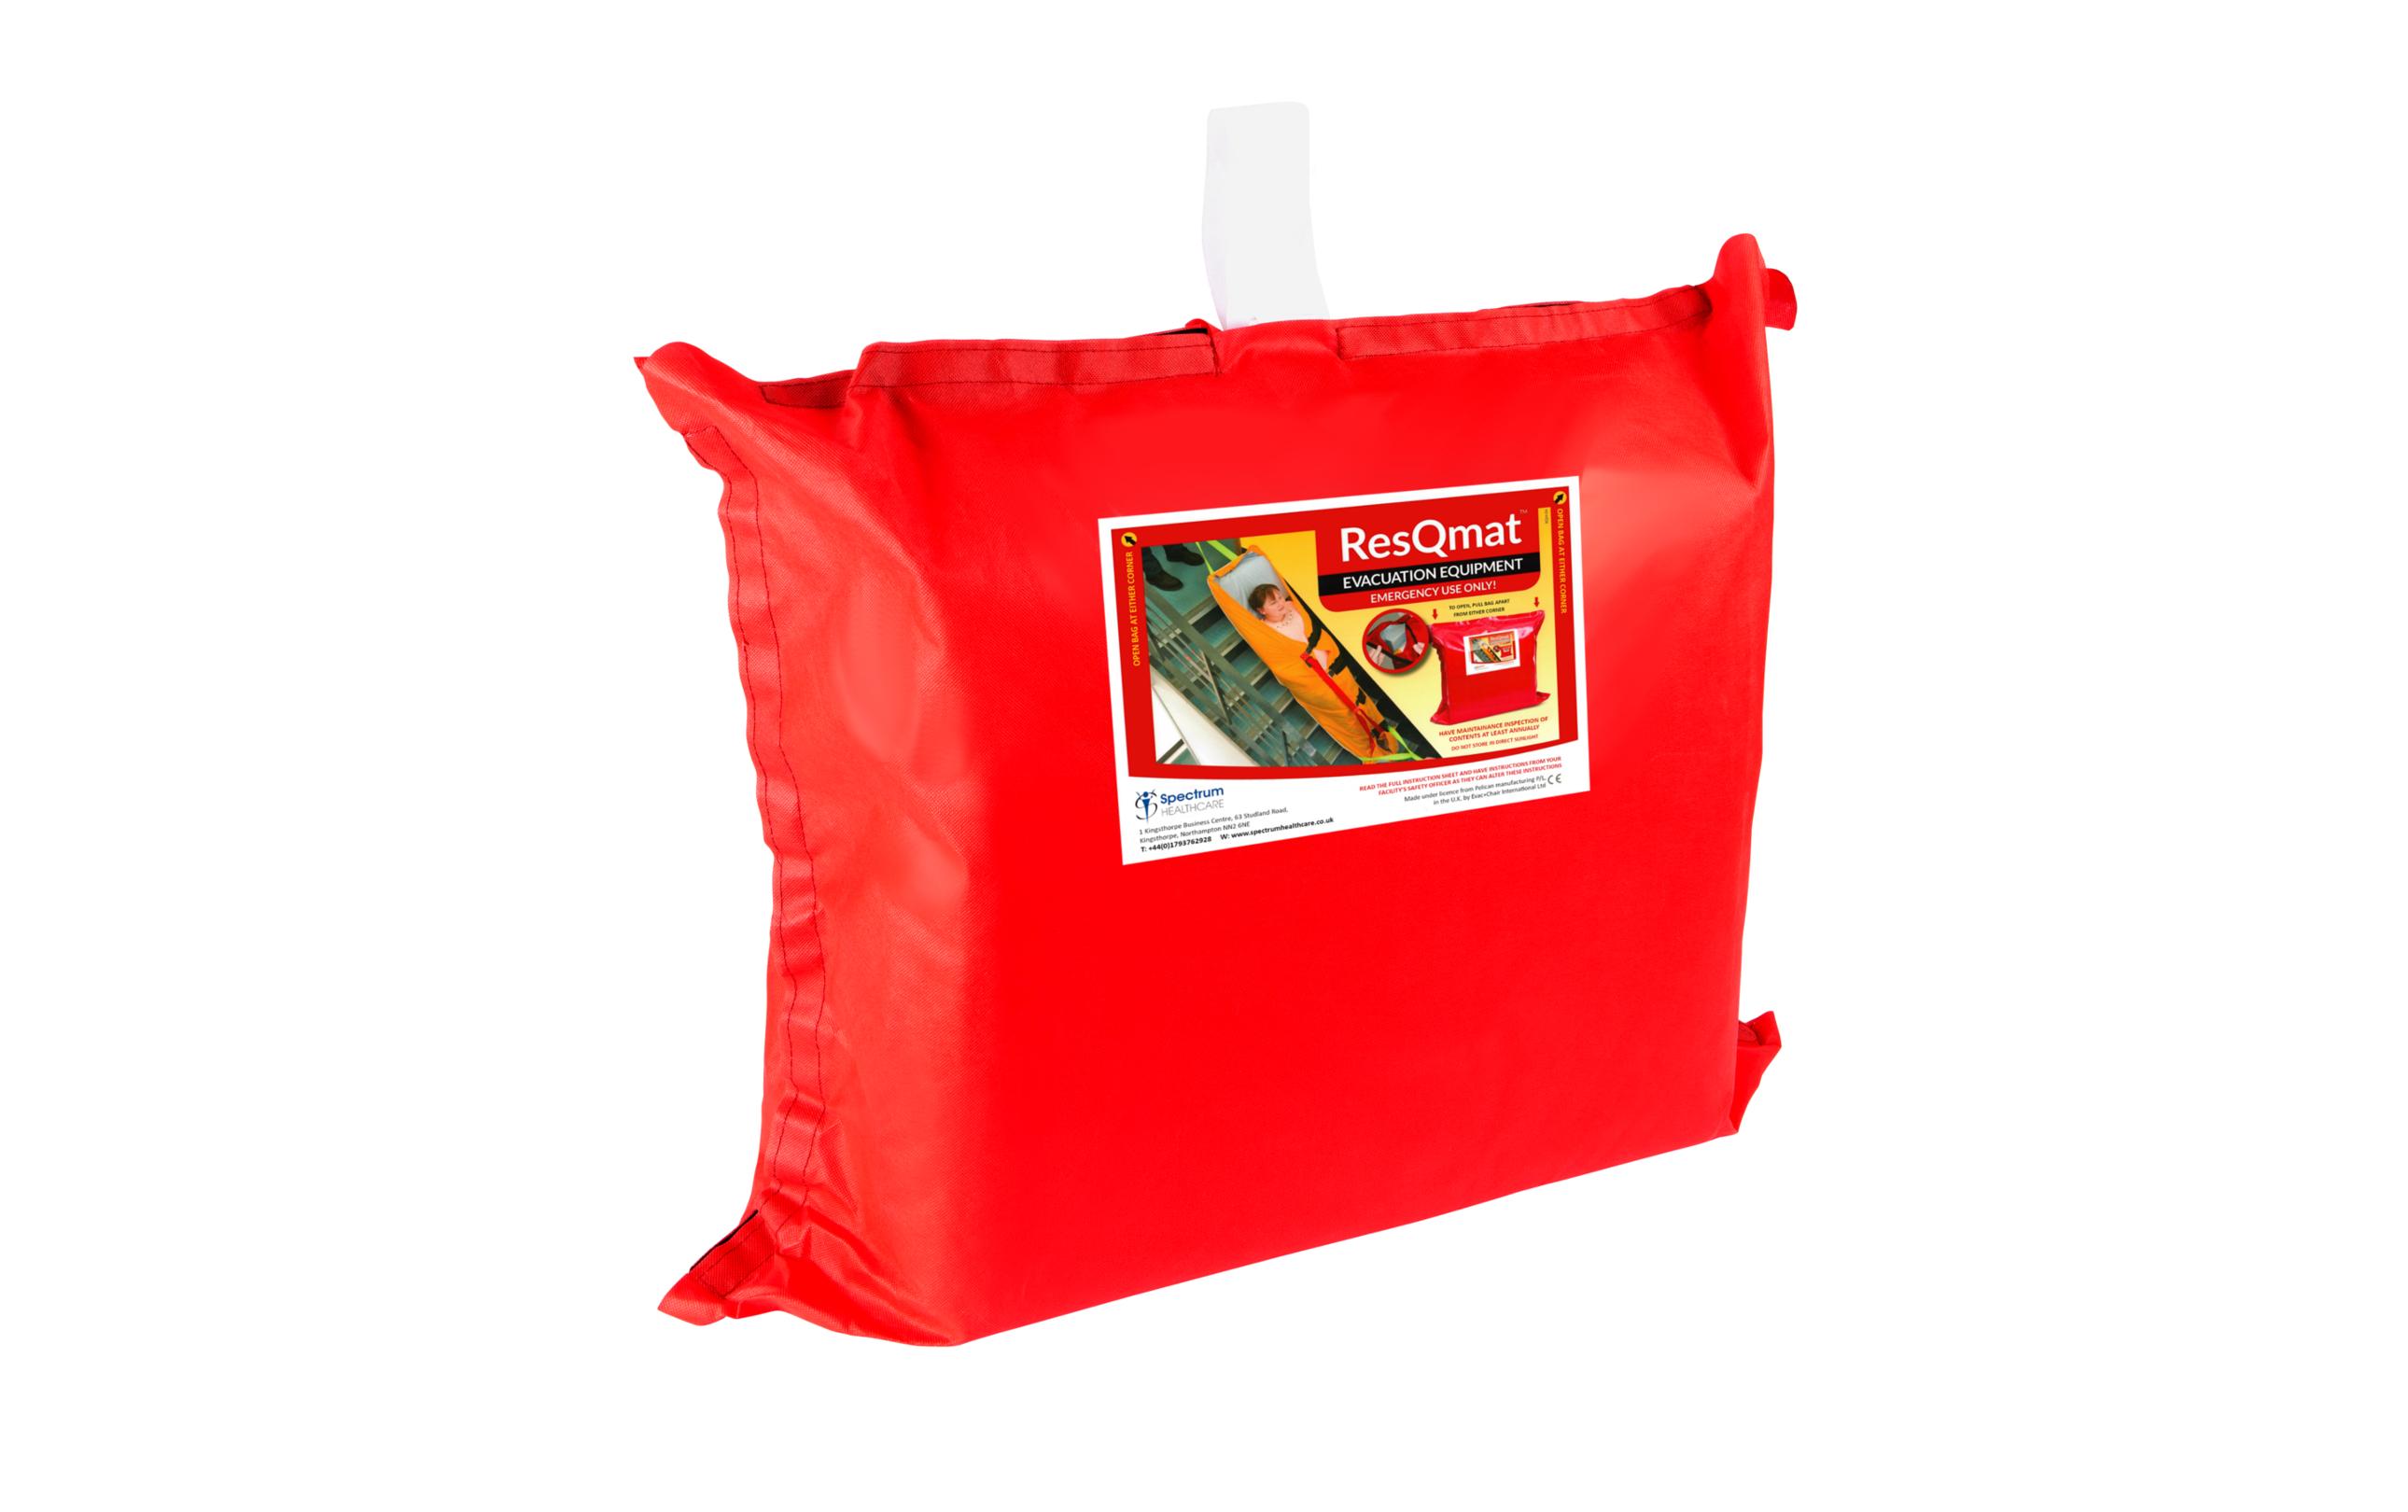 ResQmat Bag (2)